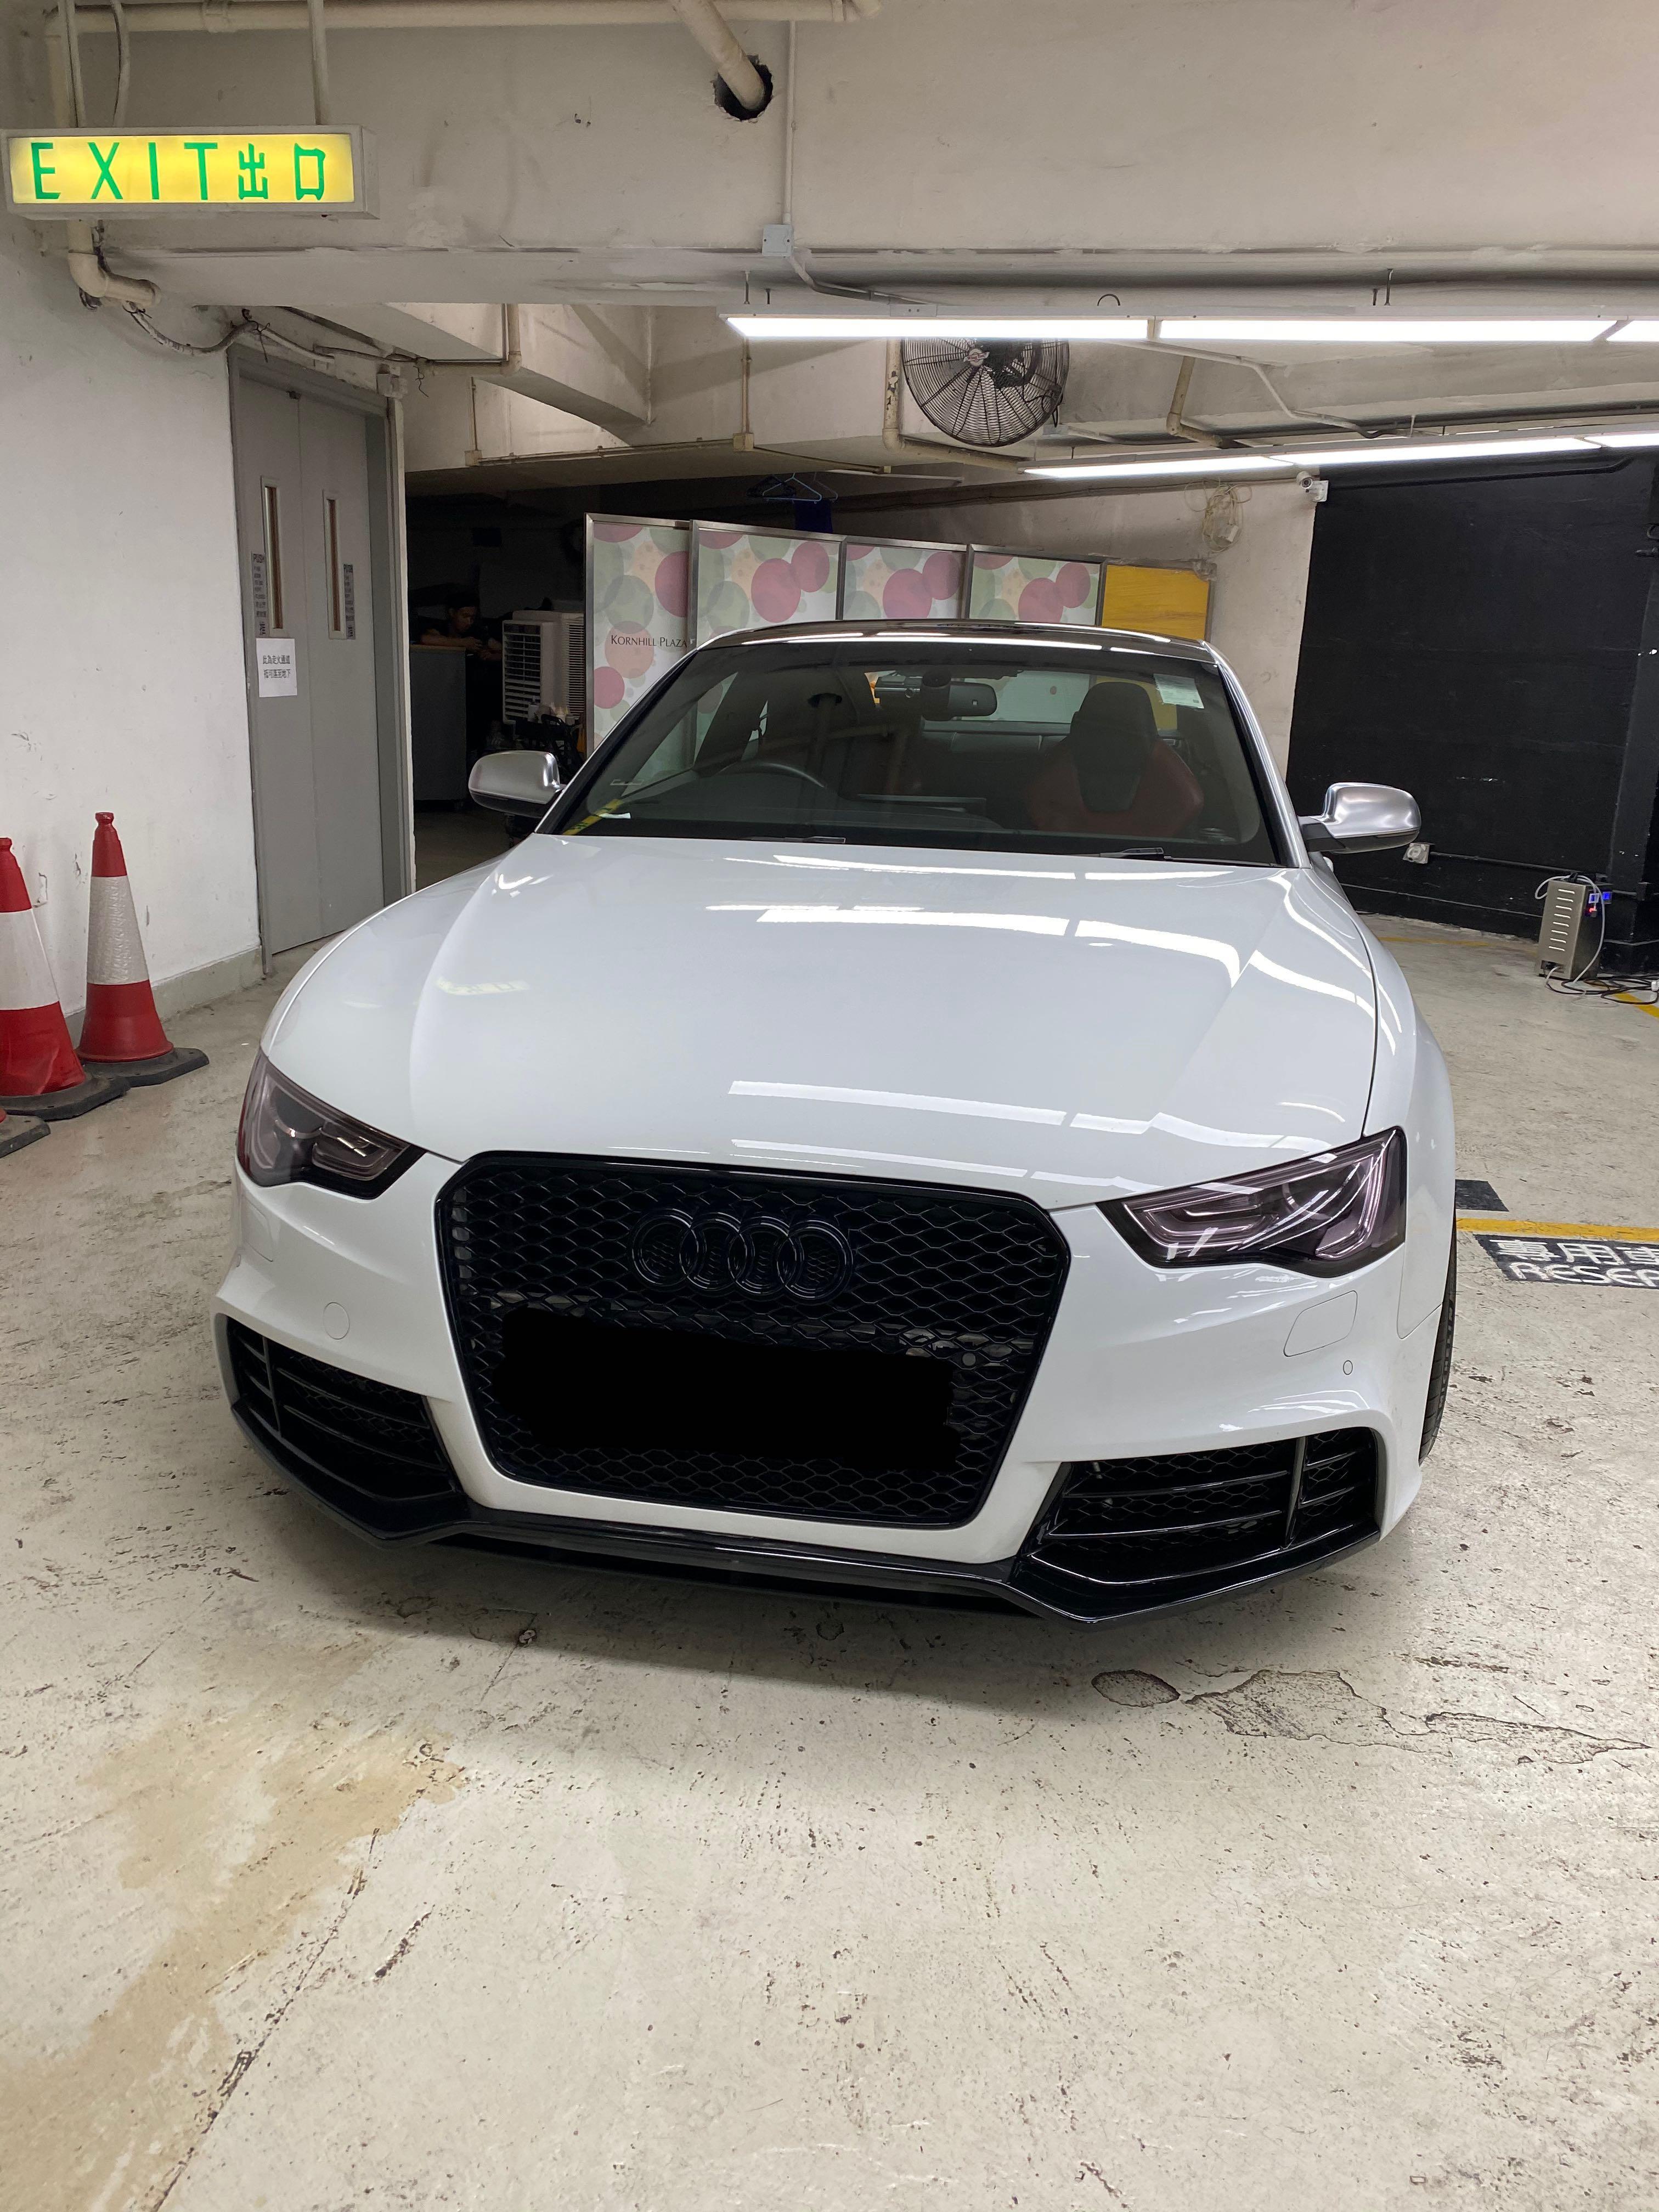 Audi S5 Coupe 3.0 TFSI quattro S tronic DSG (A)